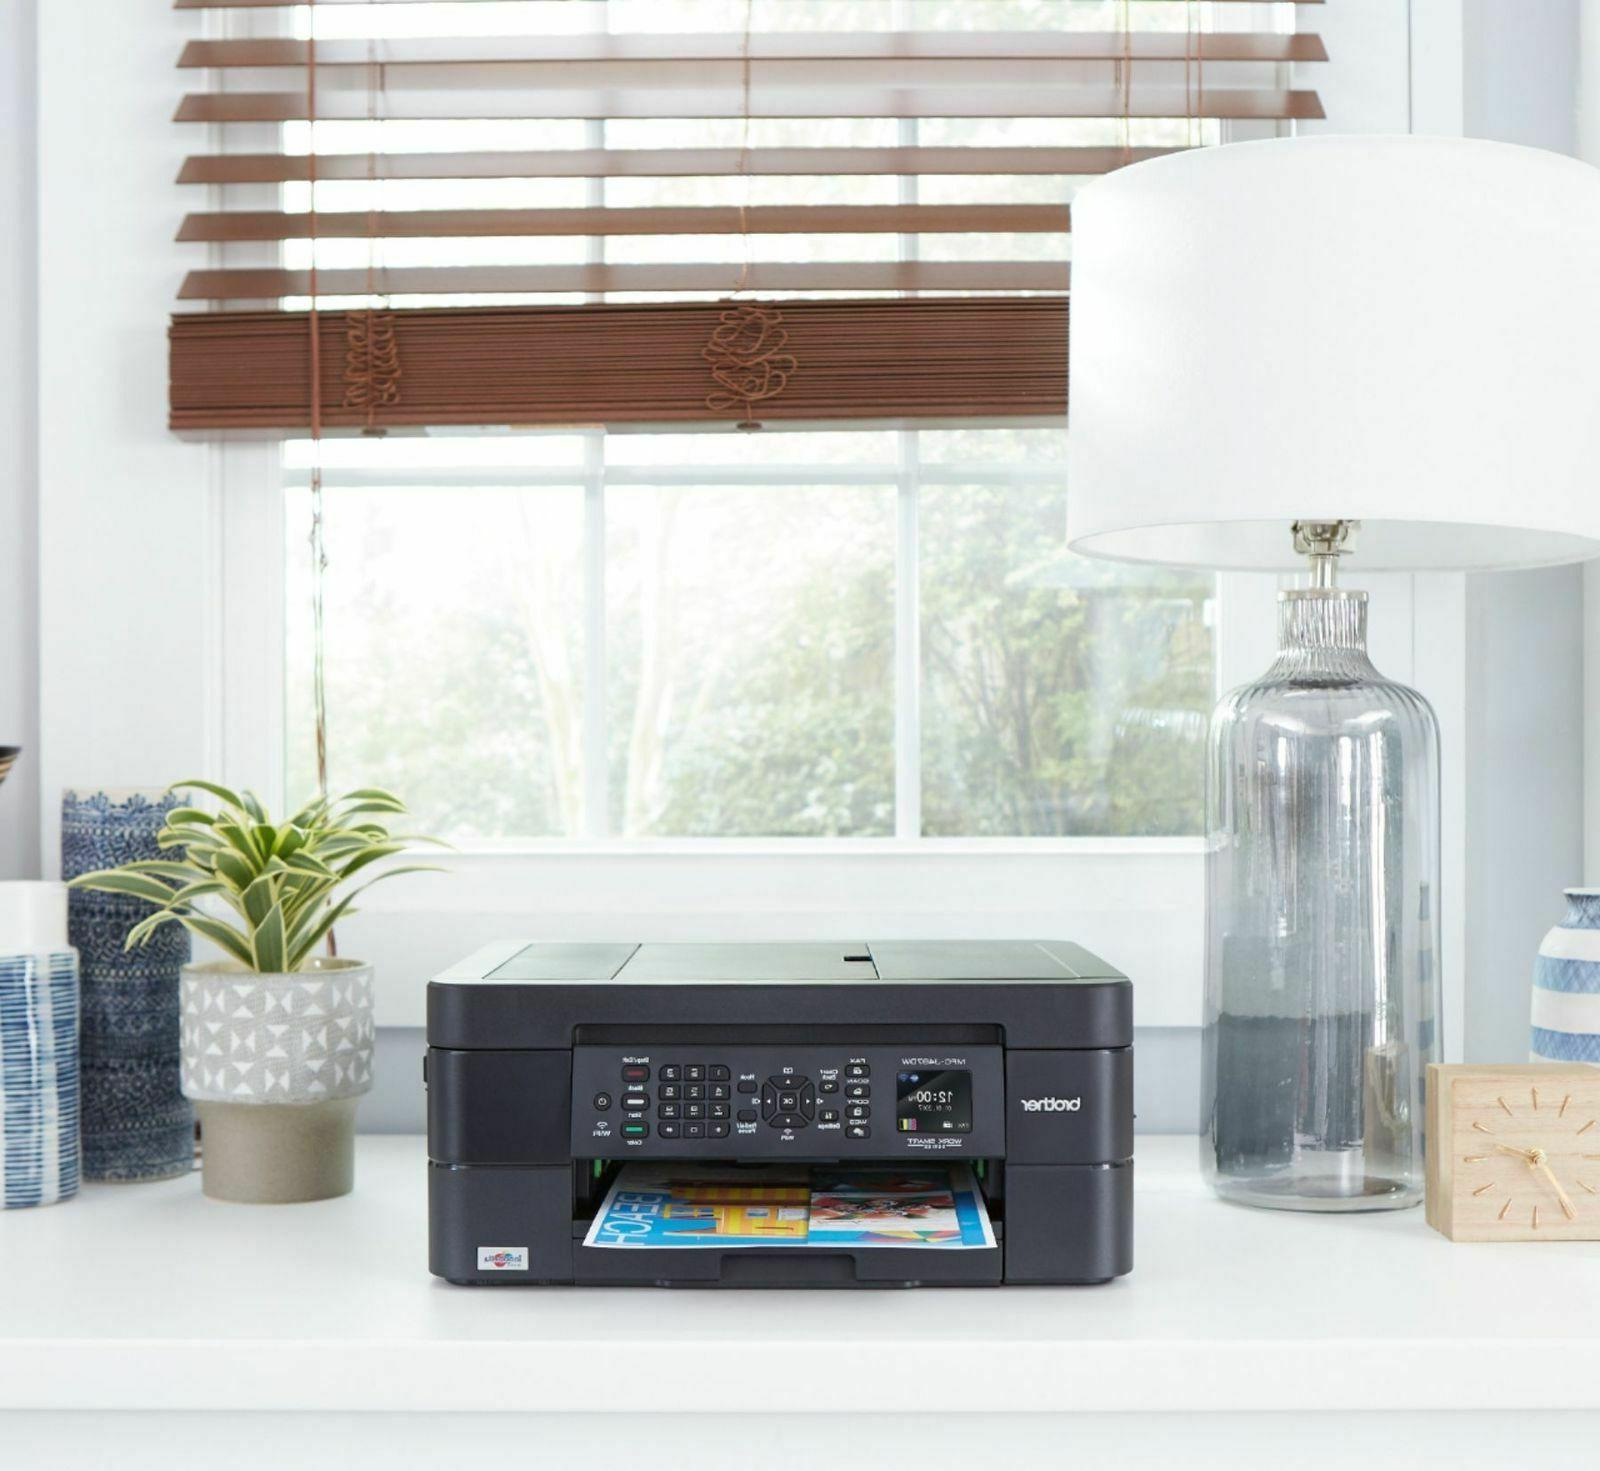 NEW Smart Series Printer